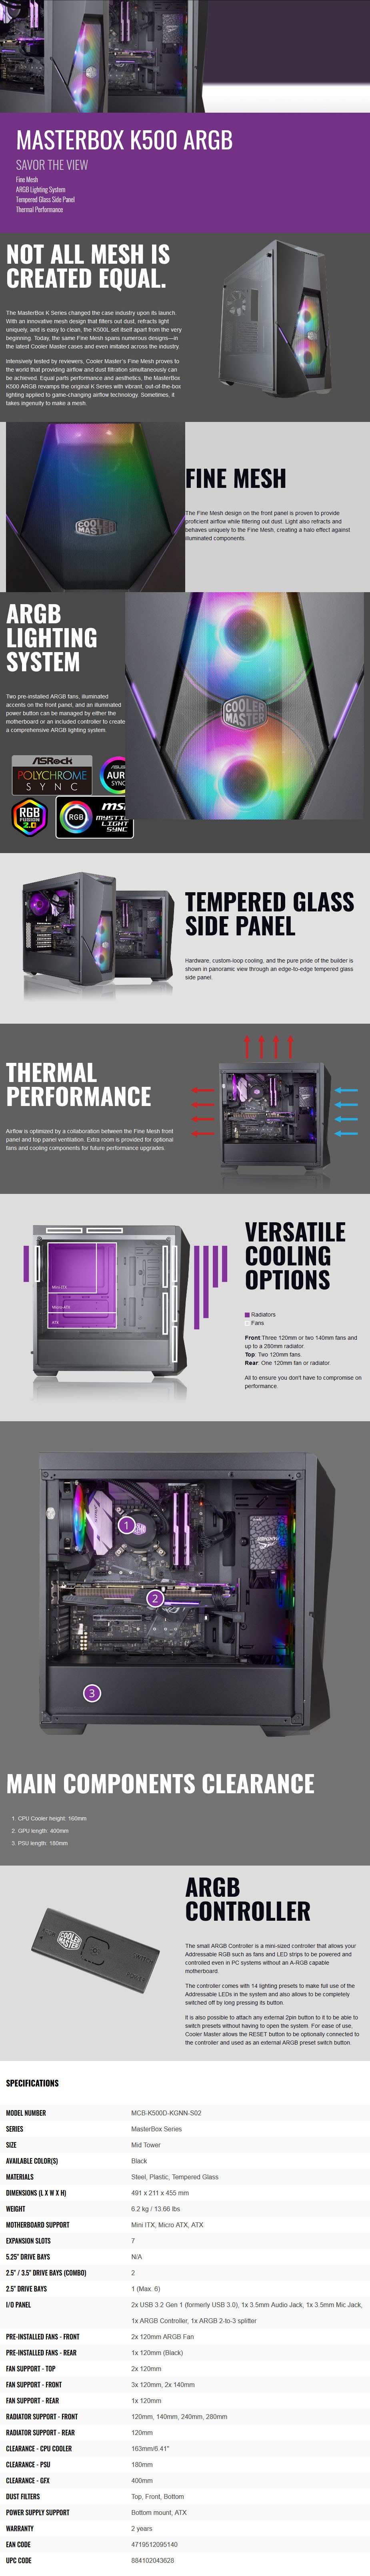 cooler-master-masterbox-k500-argb-tempered-glass-midtower-atx-case-ac41047-10.jpg